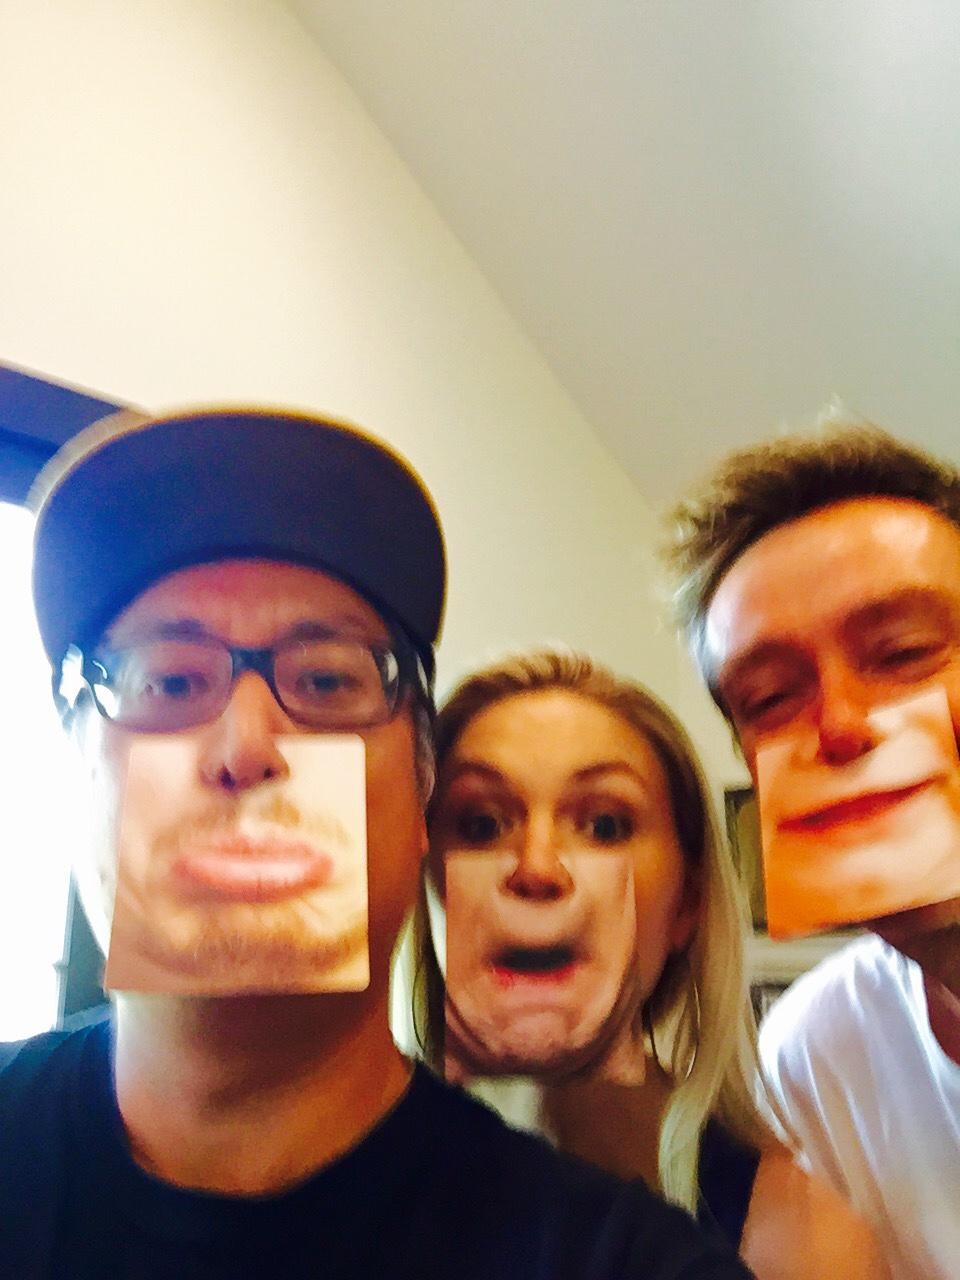 Nashville writing session with Lindsay Rae & Boots Ottestad